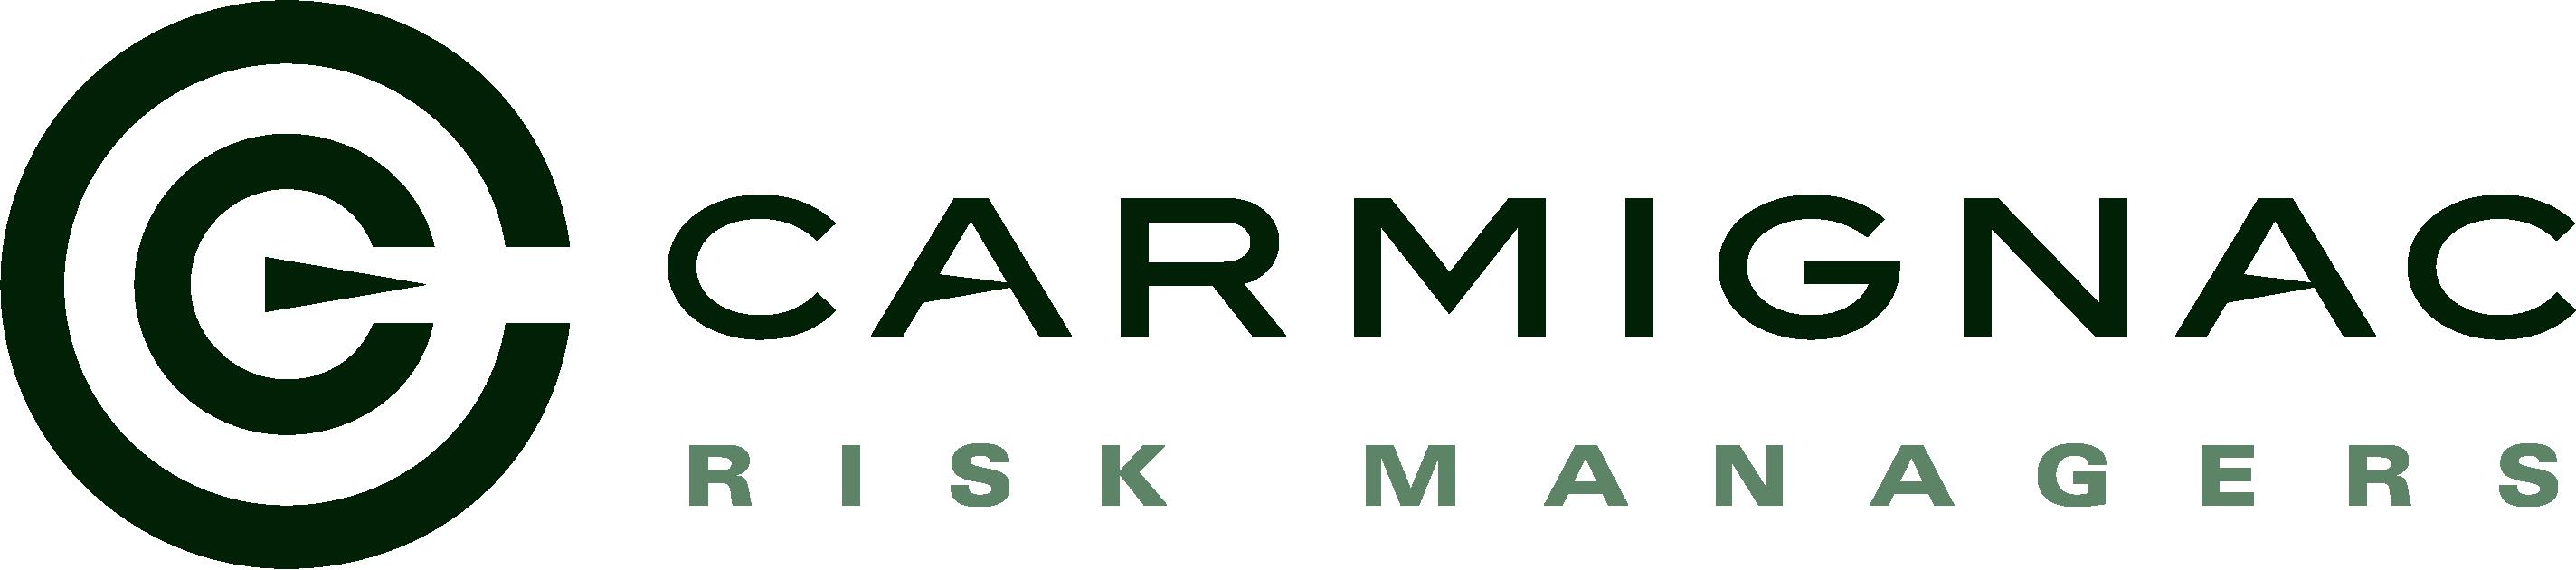 Carmignac logo Rankia